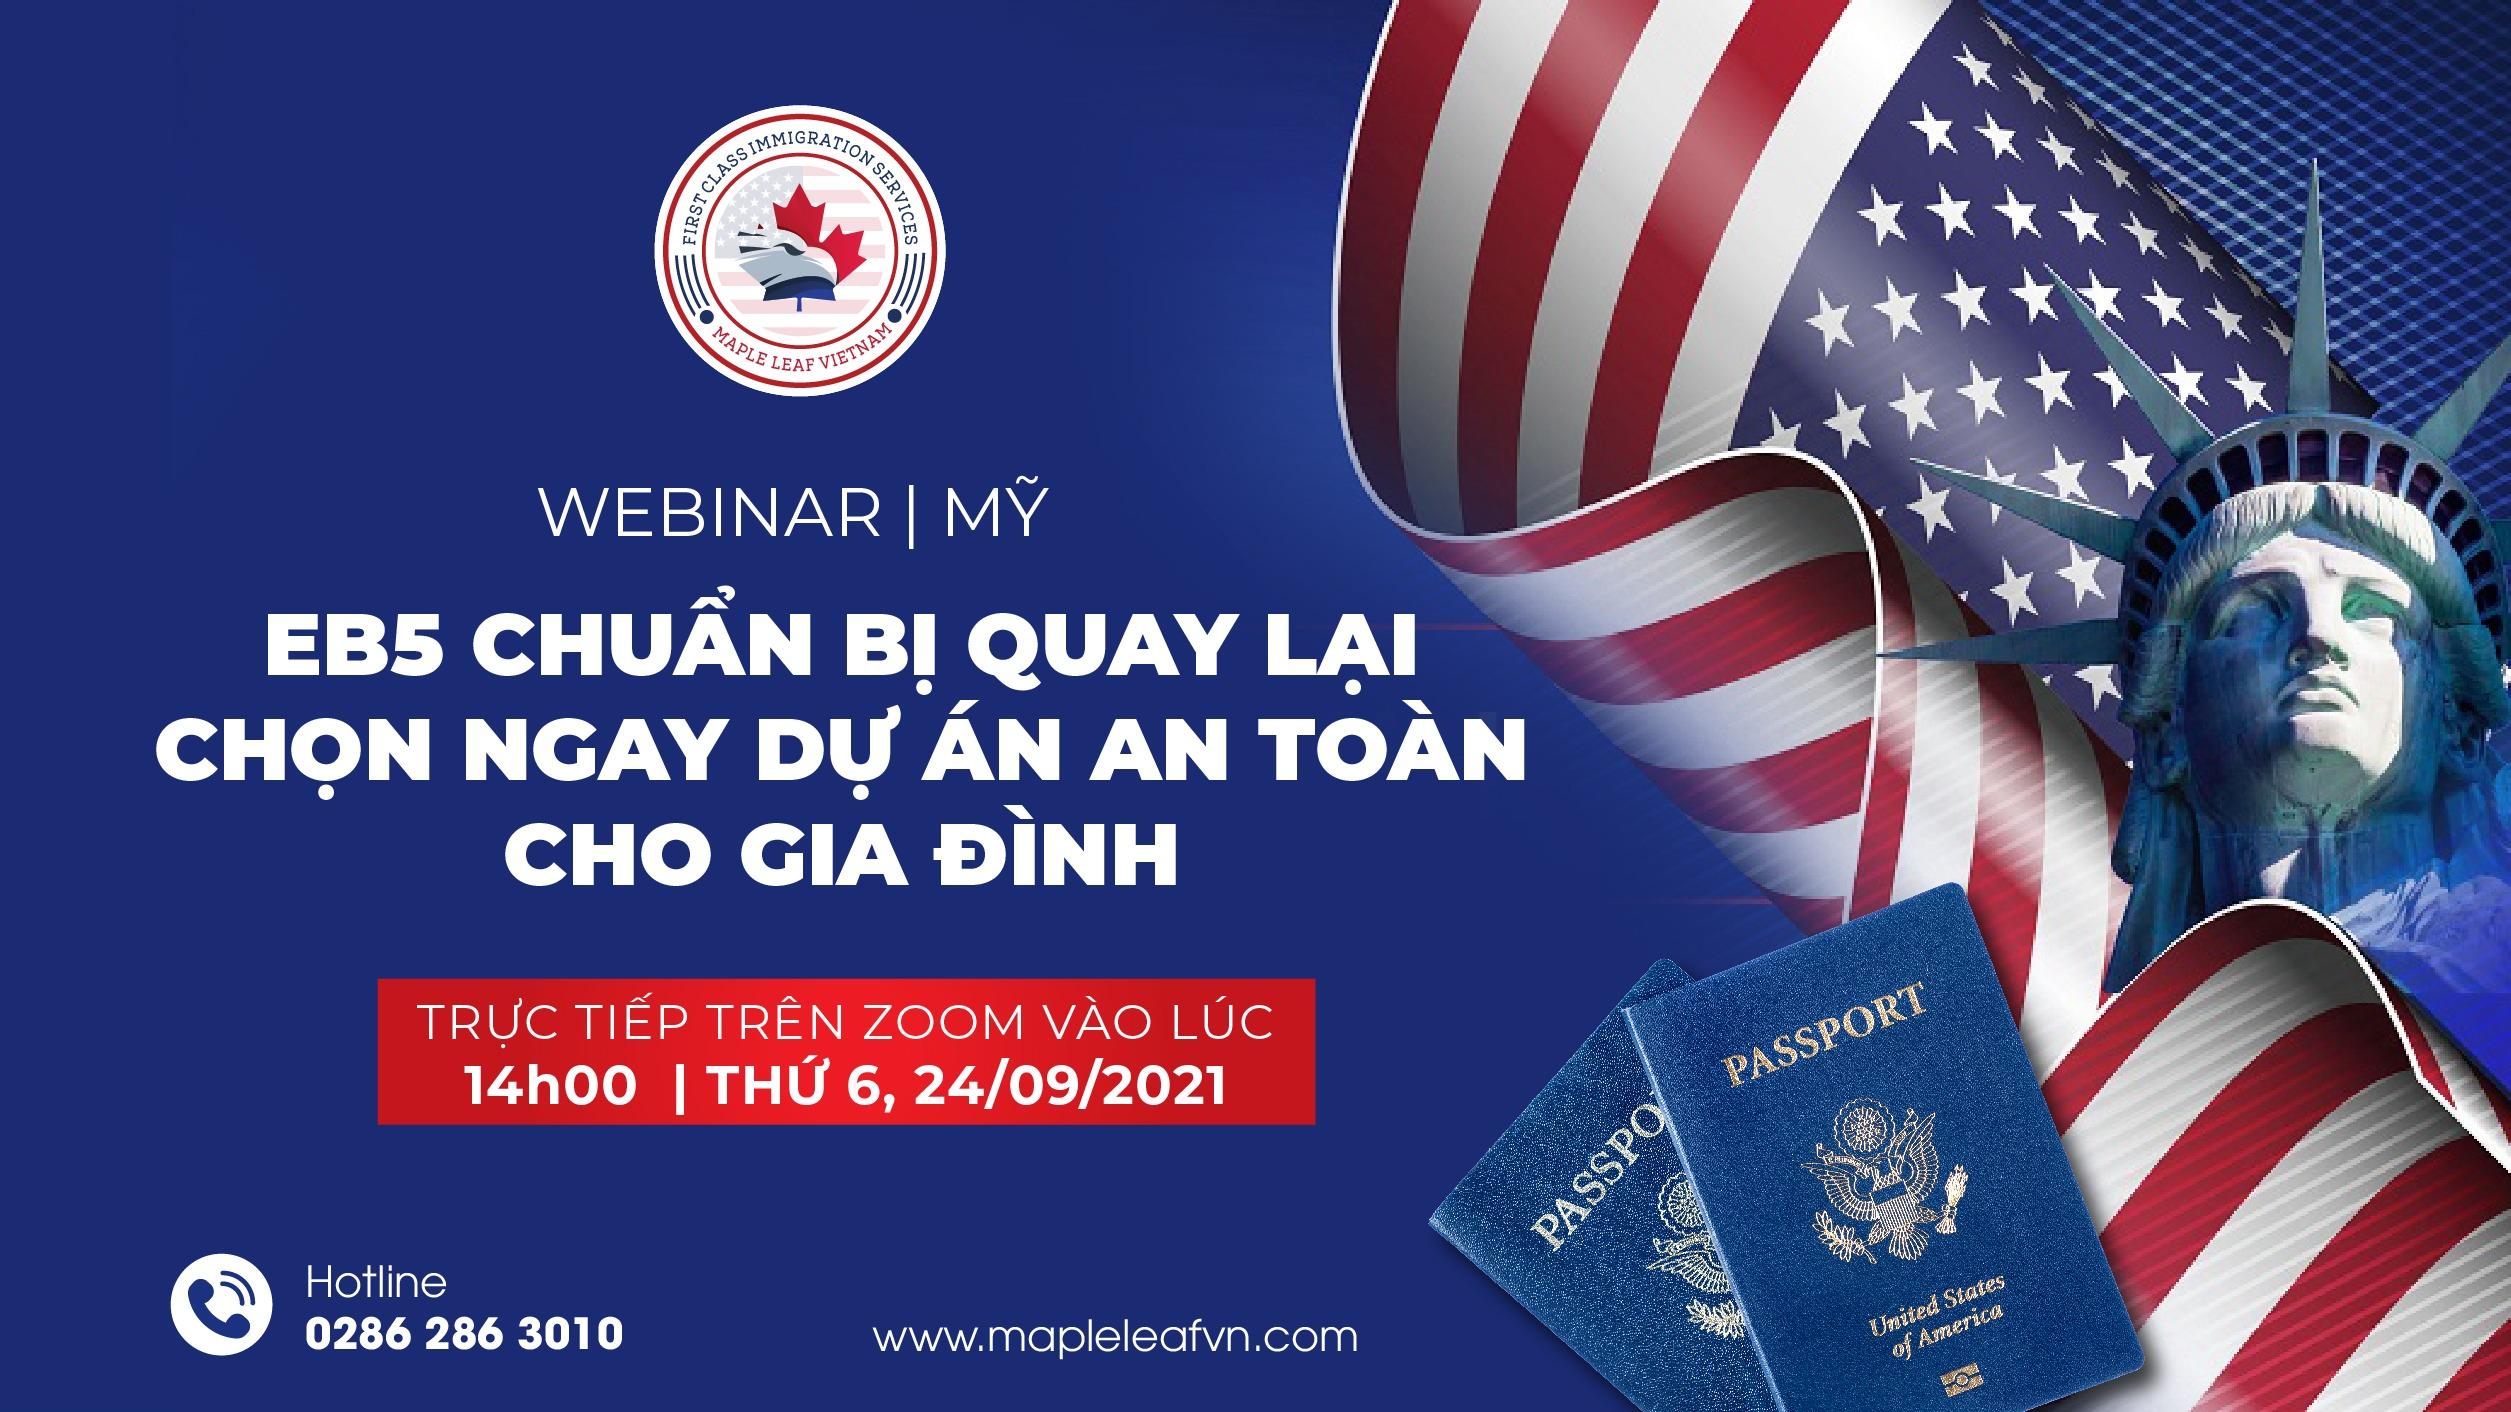 webinar-my-eb5-chuan-bi-quay-lai-chon-ngay-du-an-an-toan-cho-gia-dinh